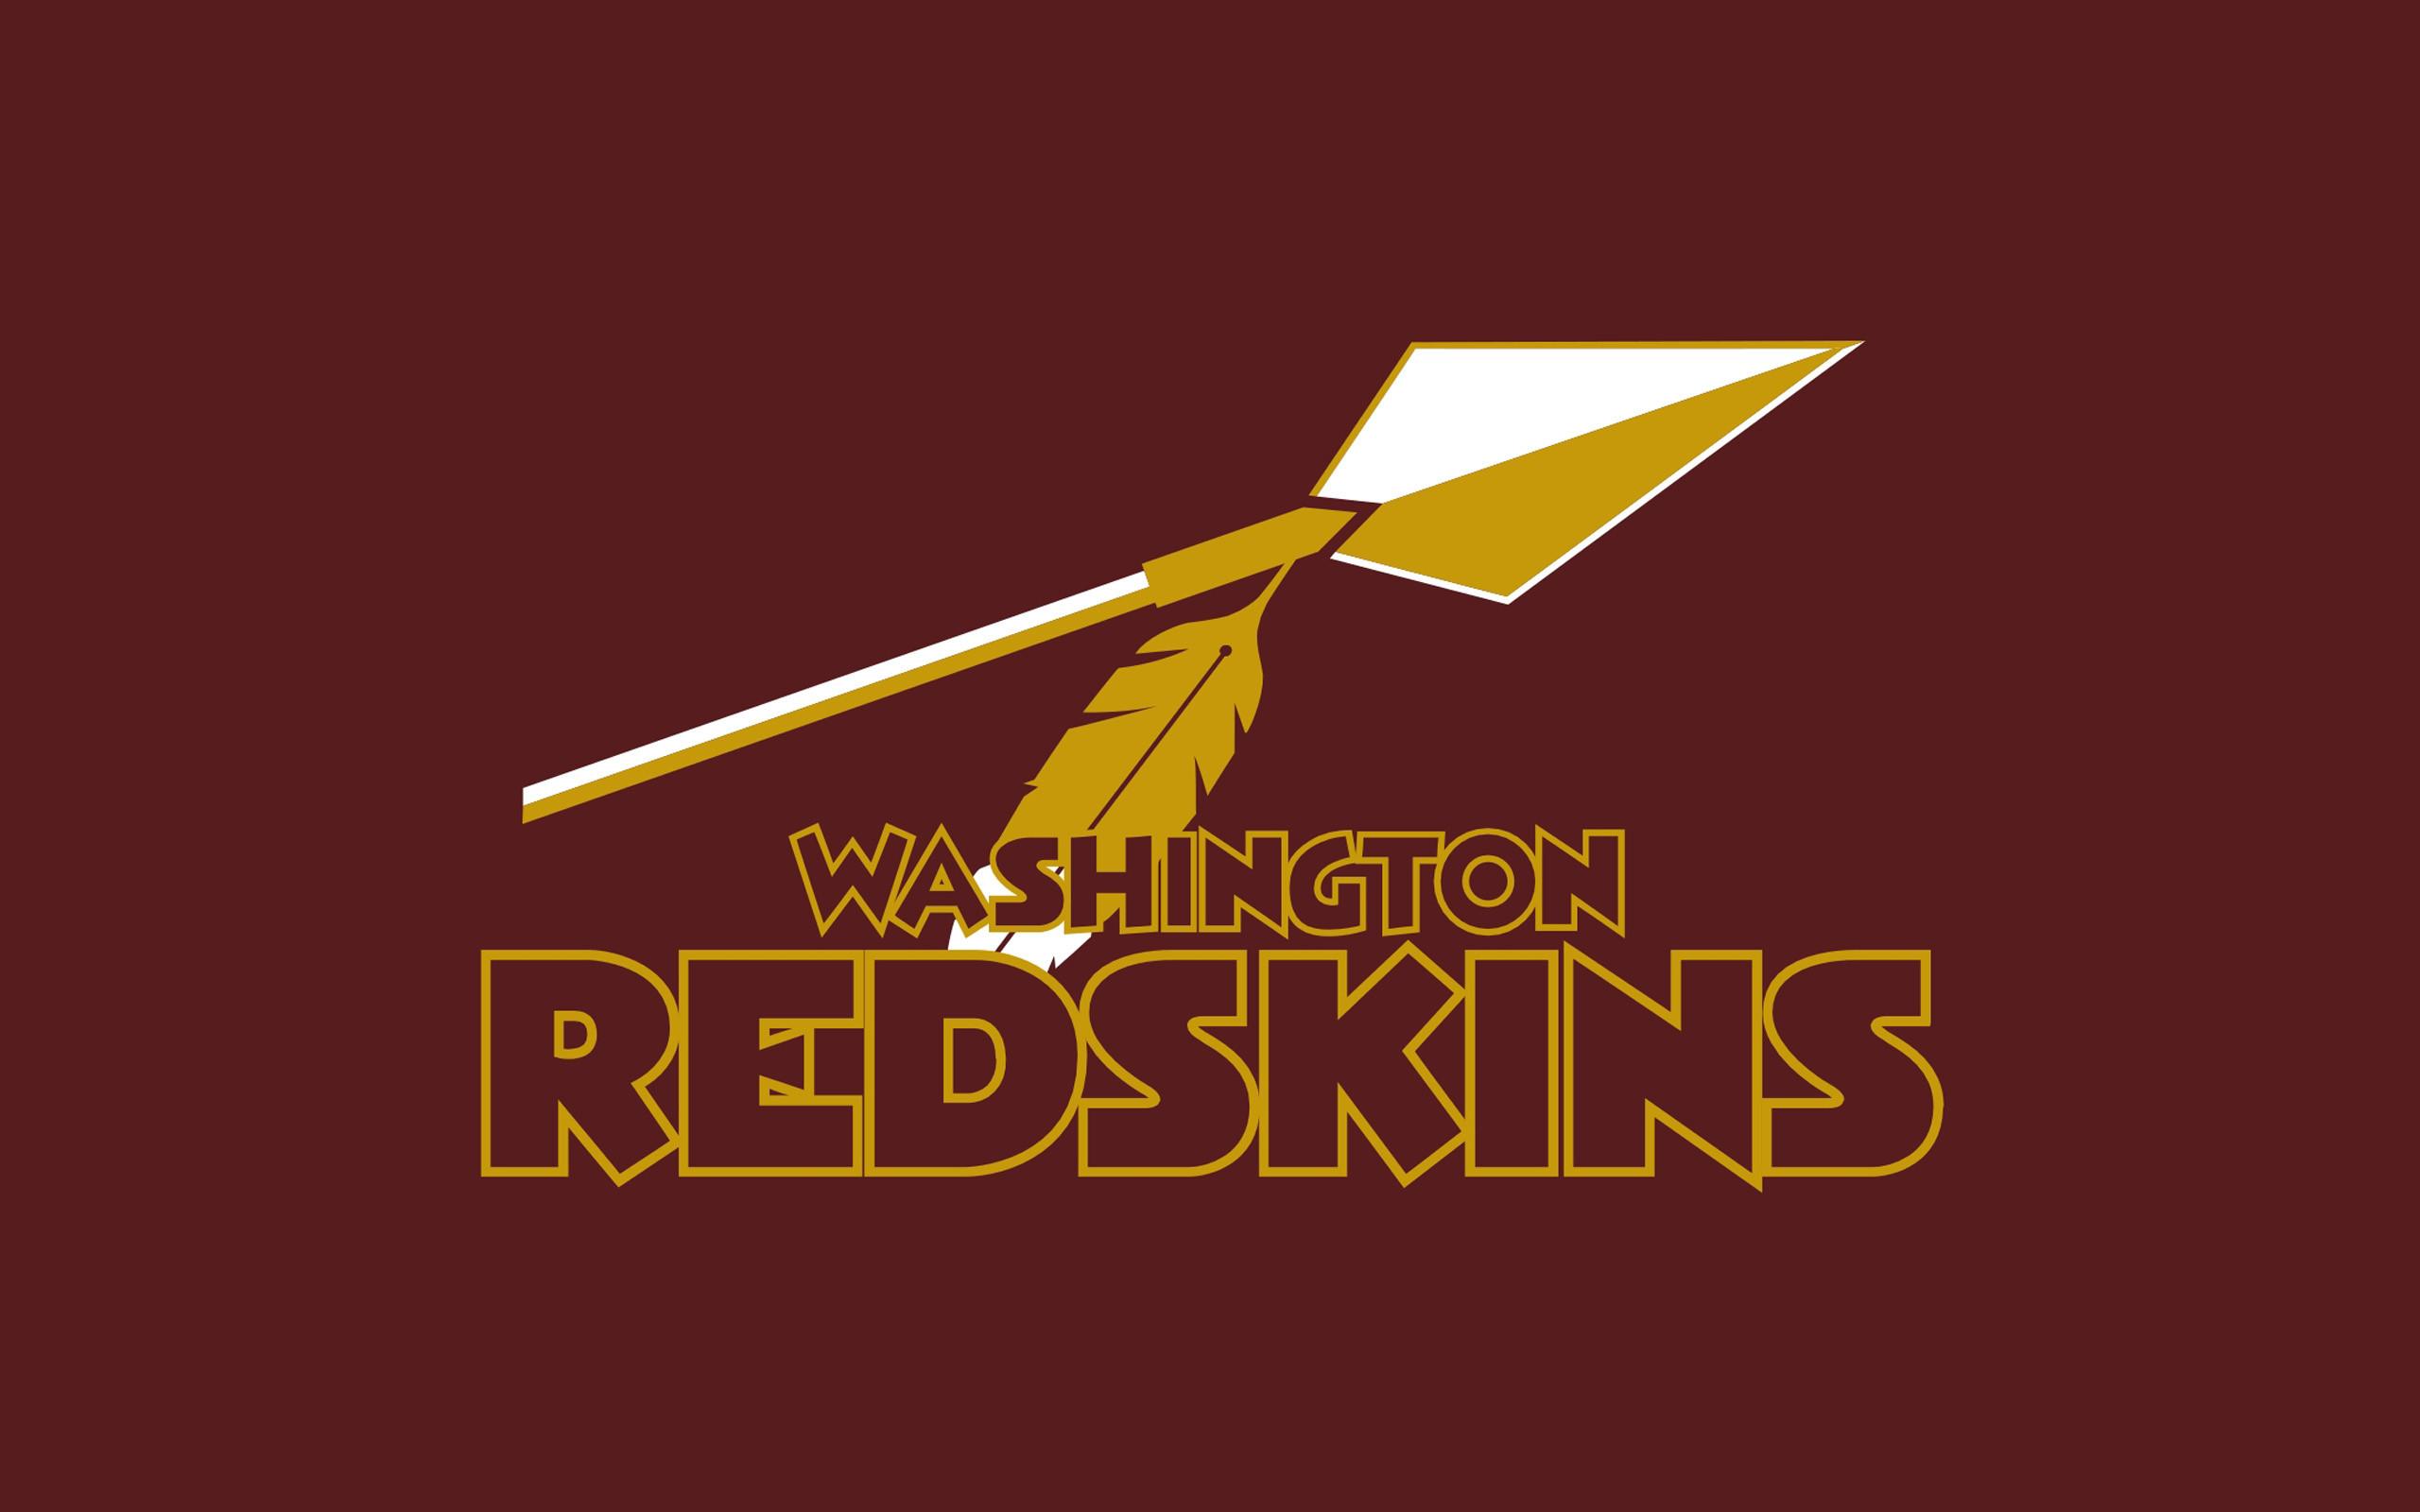 11 HD Washington Redskins Wallpapers